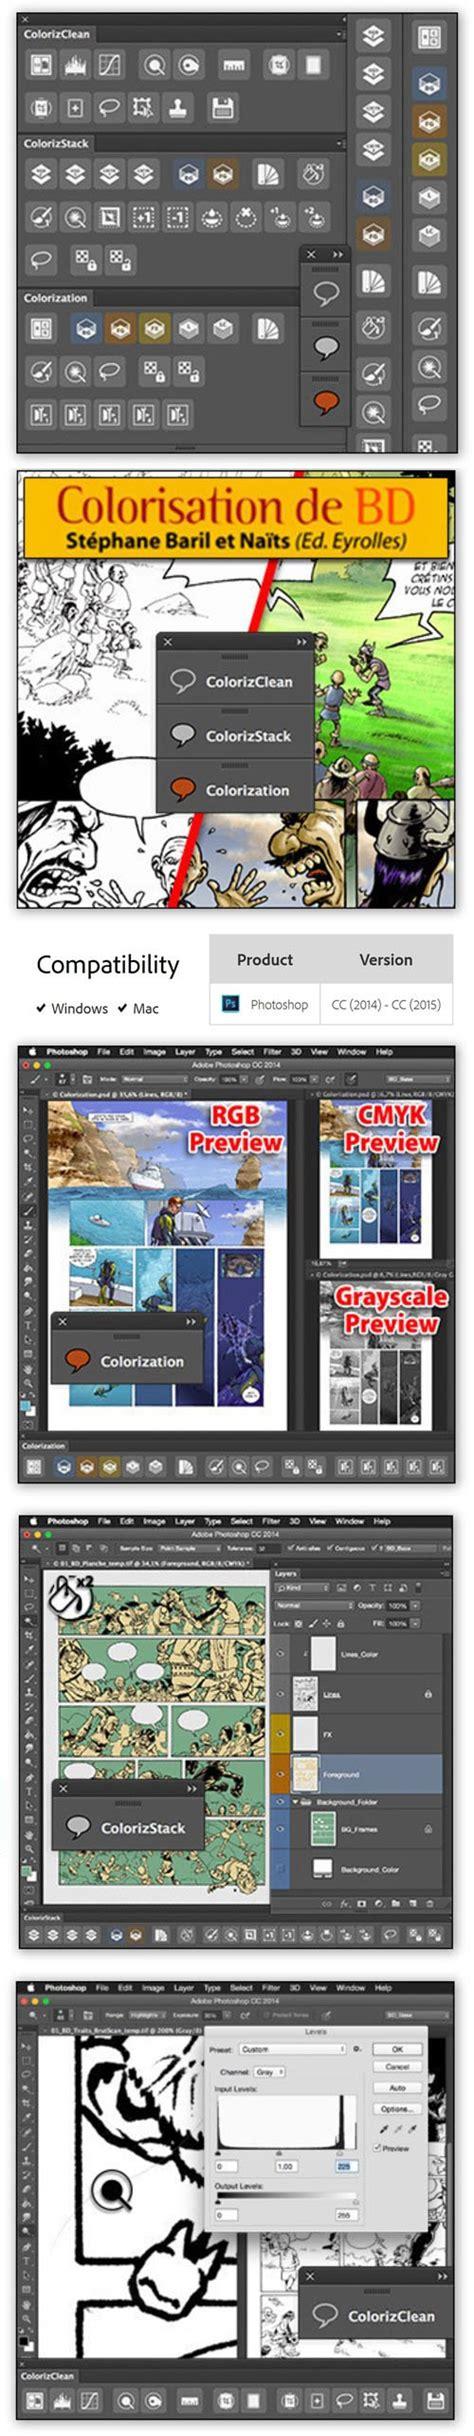 plugin cs6 colorization 1 0 1 cc 3 0 0 cs6 in for photoshop